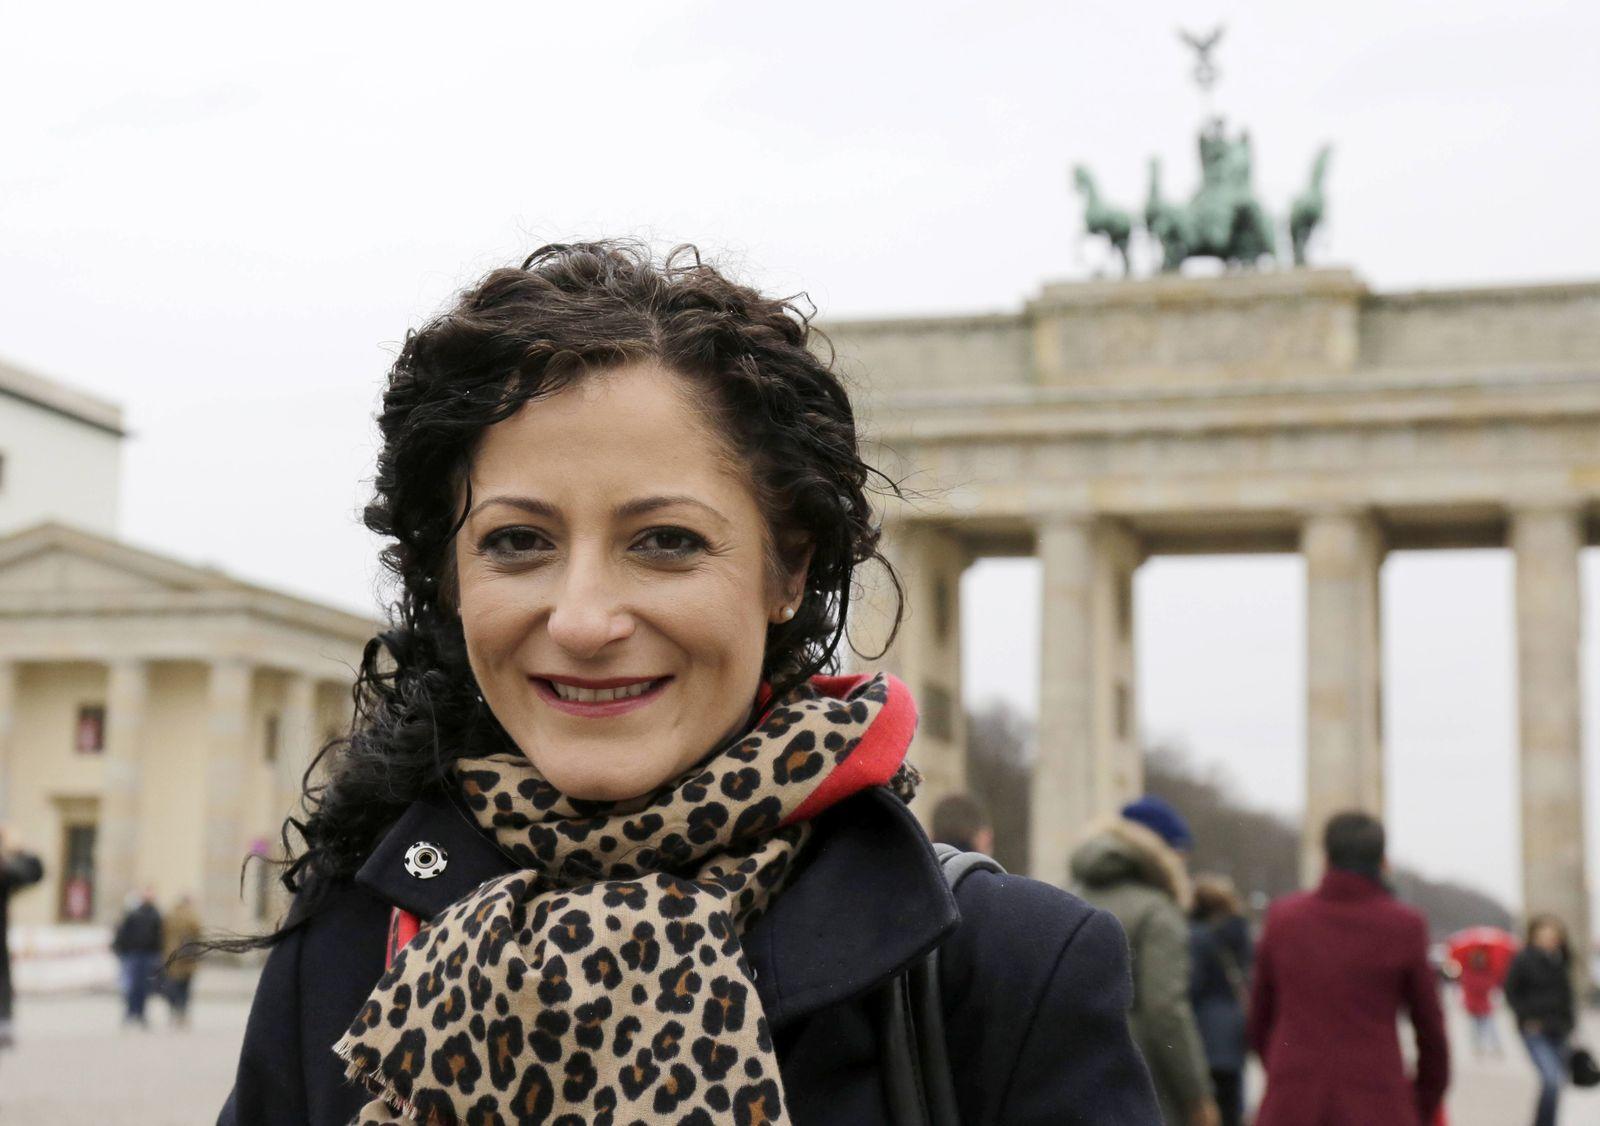 Cansel Kiziltepe SPD Deutschland Berlin Brandenburger Tor Pariser Platz Mitmach Aktion des Deu